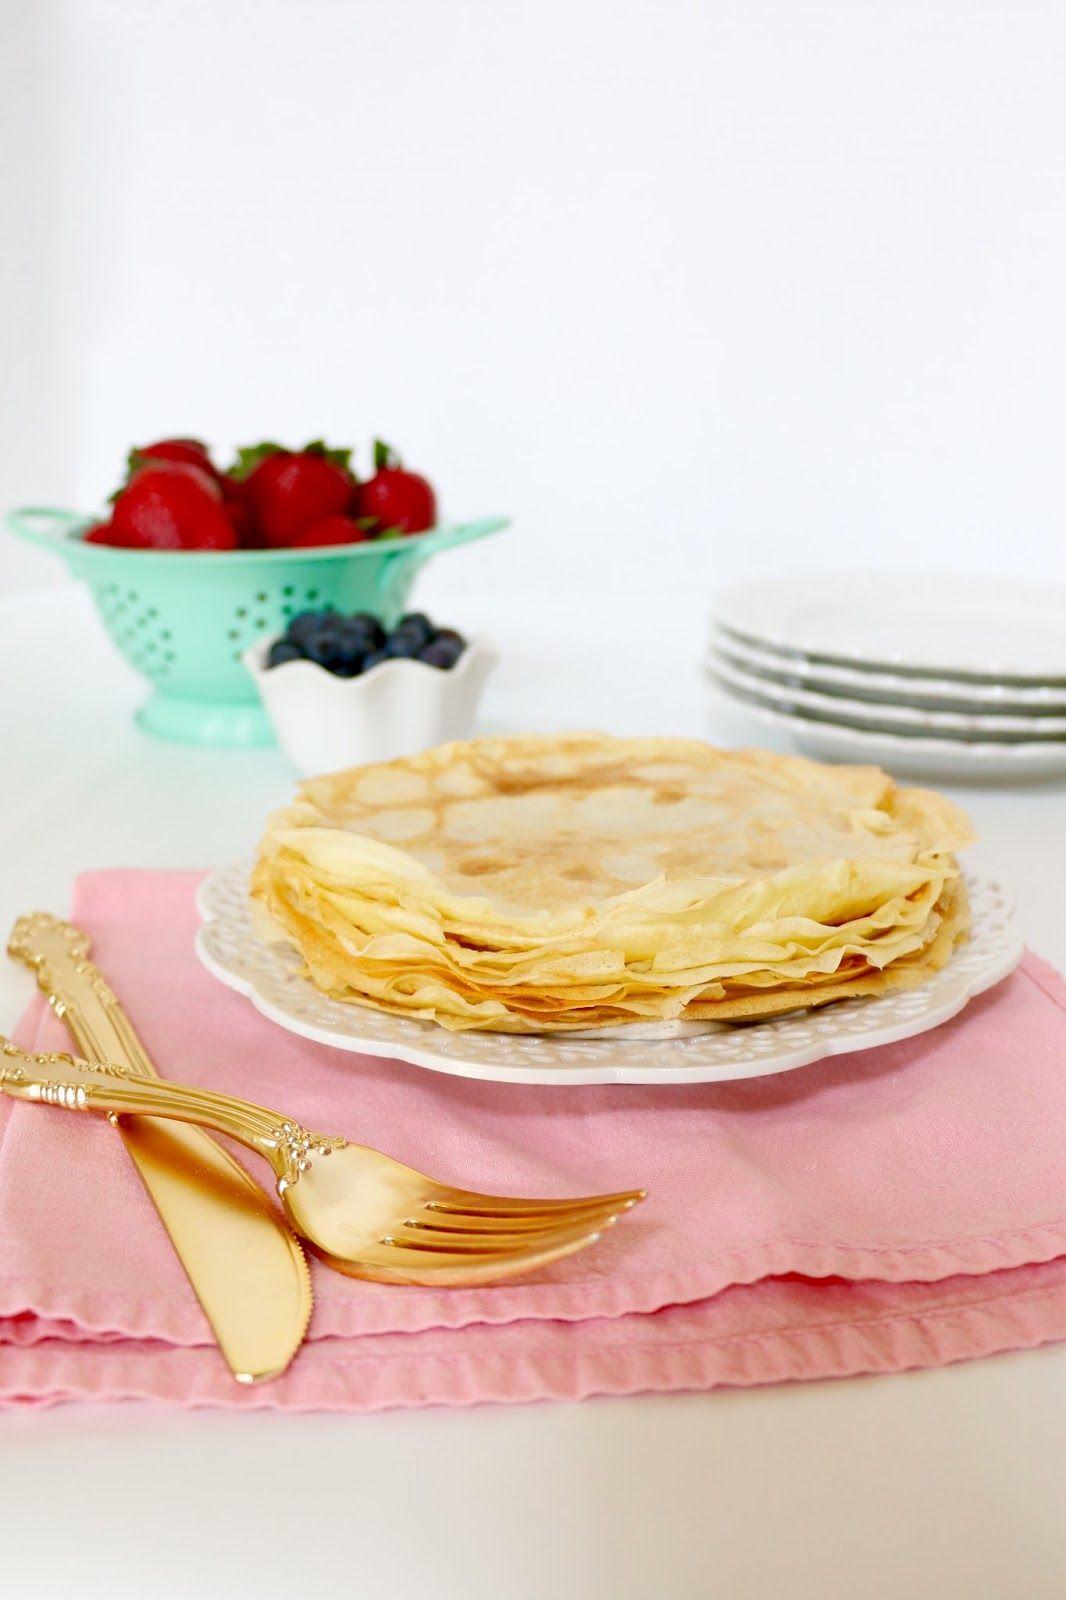 Lindsay ann bakes video easy pancake mix crpes classic savory lindsay ann bakes video easy pancake mix crpes classic savory ccuart Gallery